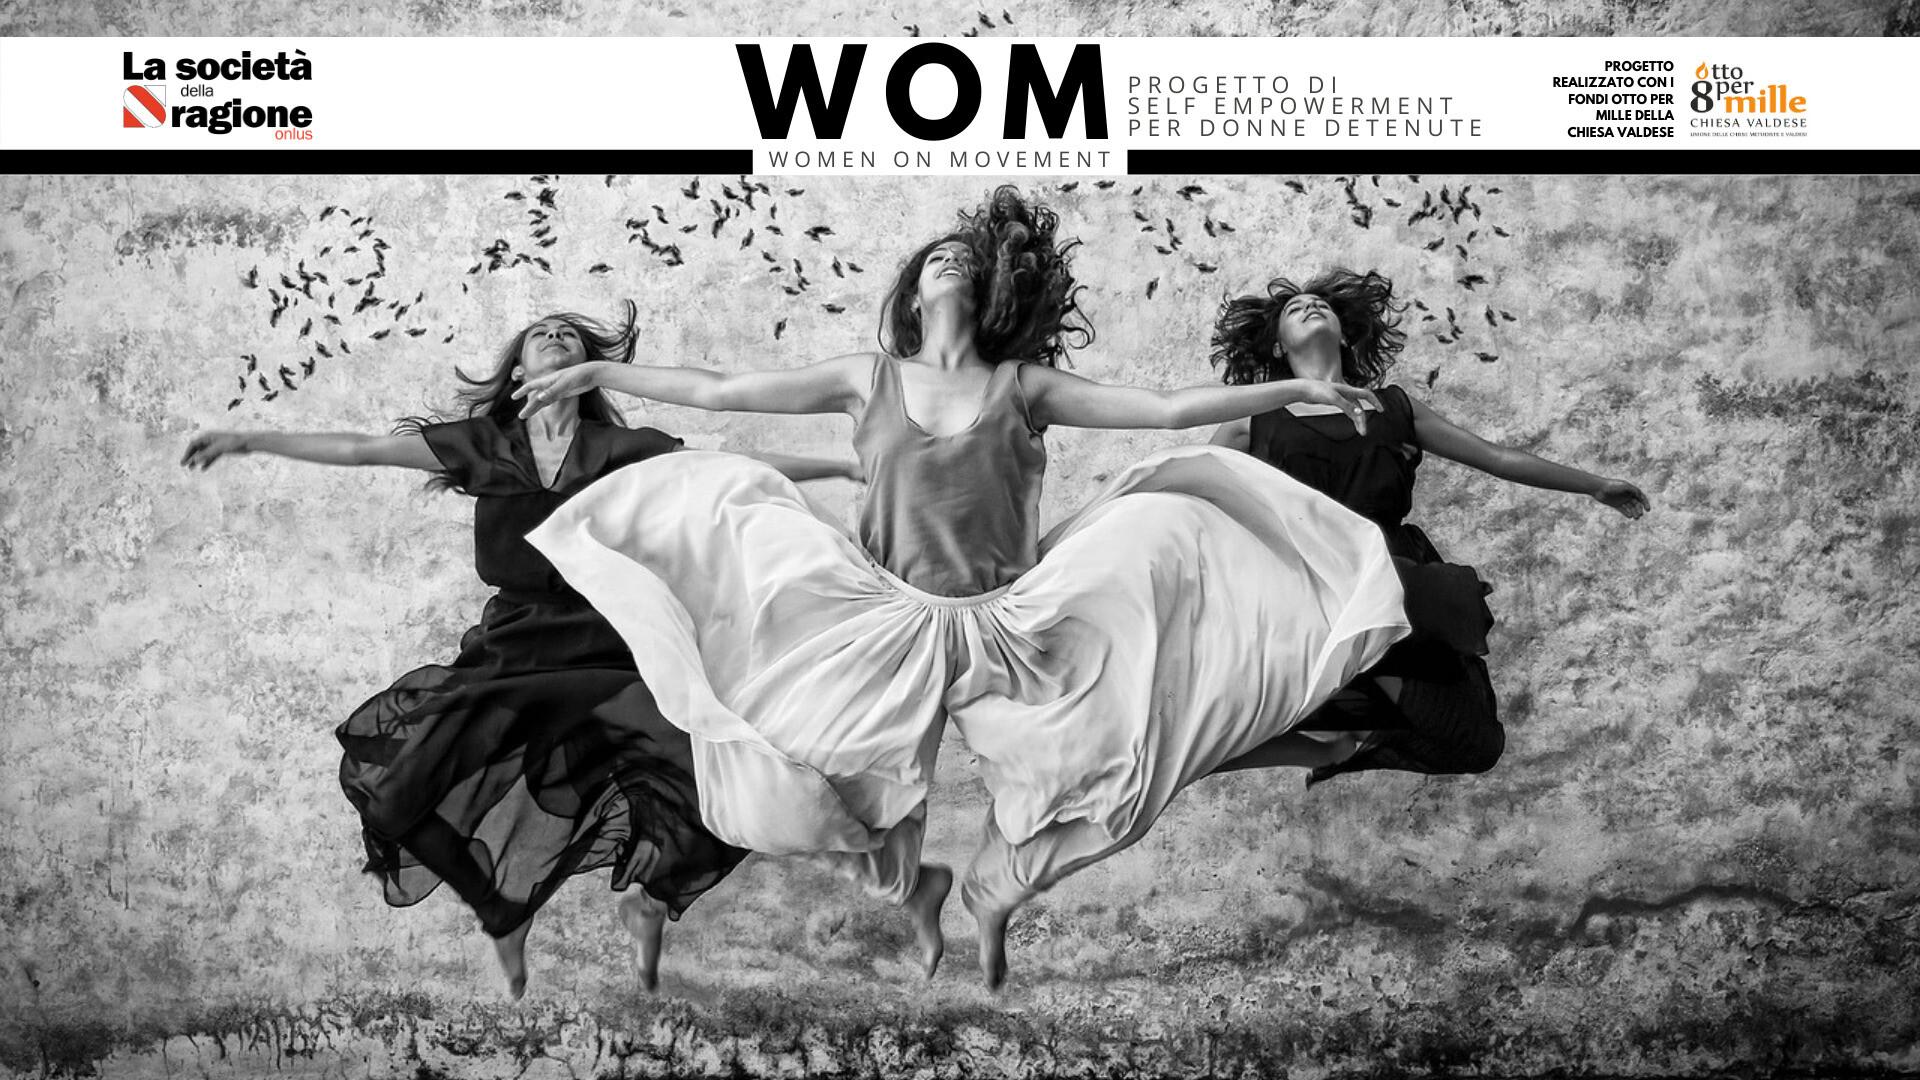 WOM self empowerment